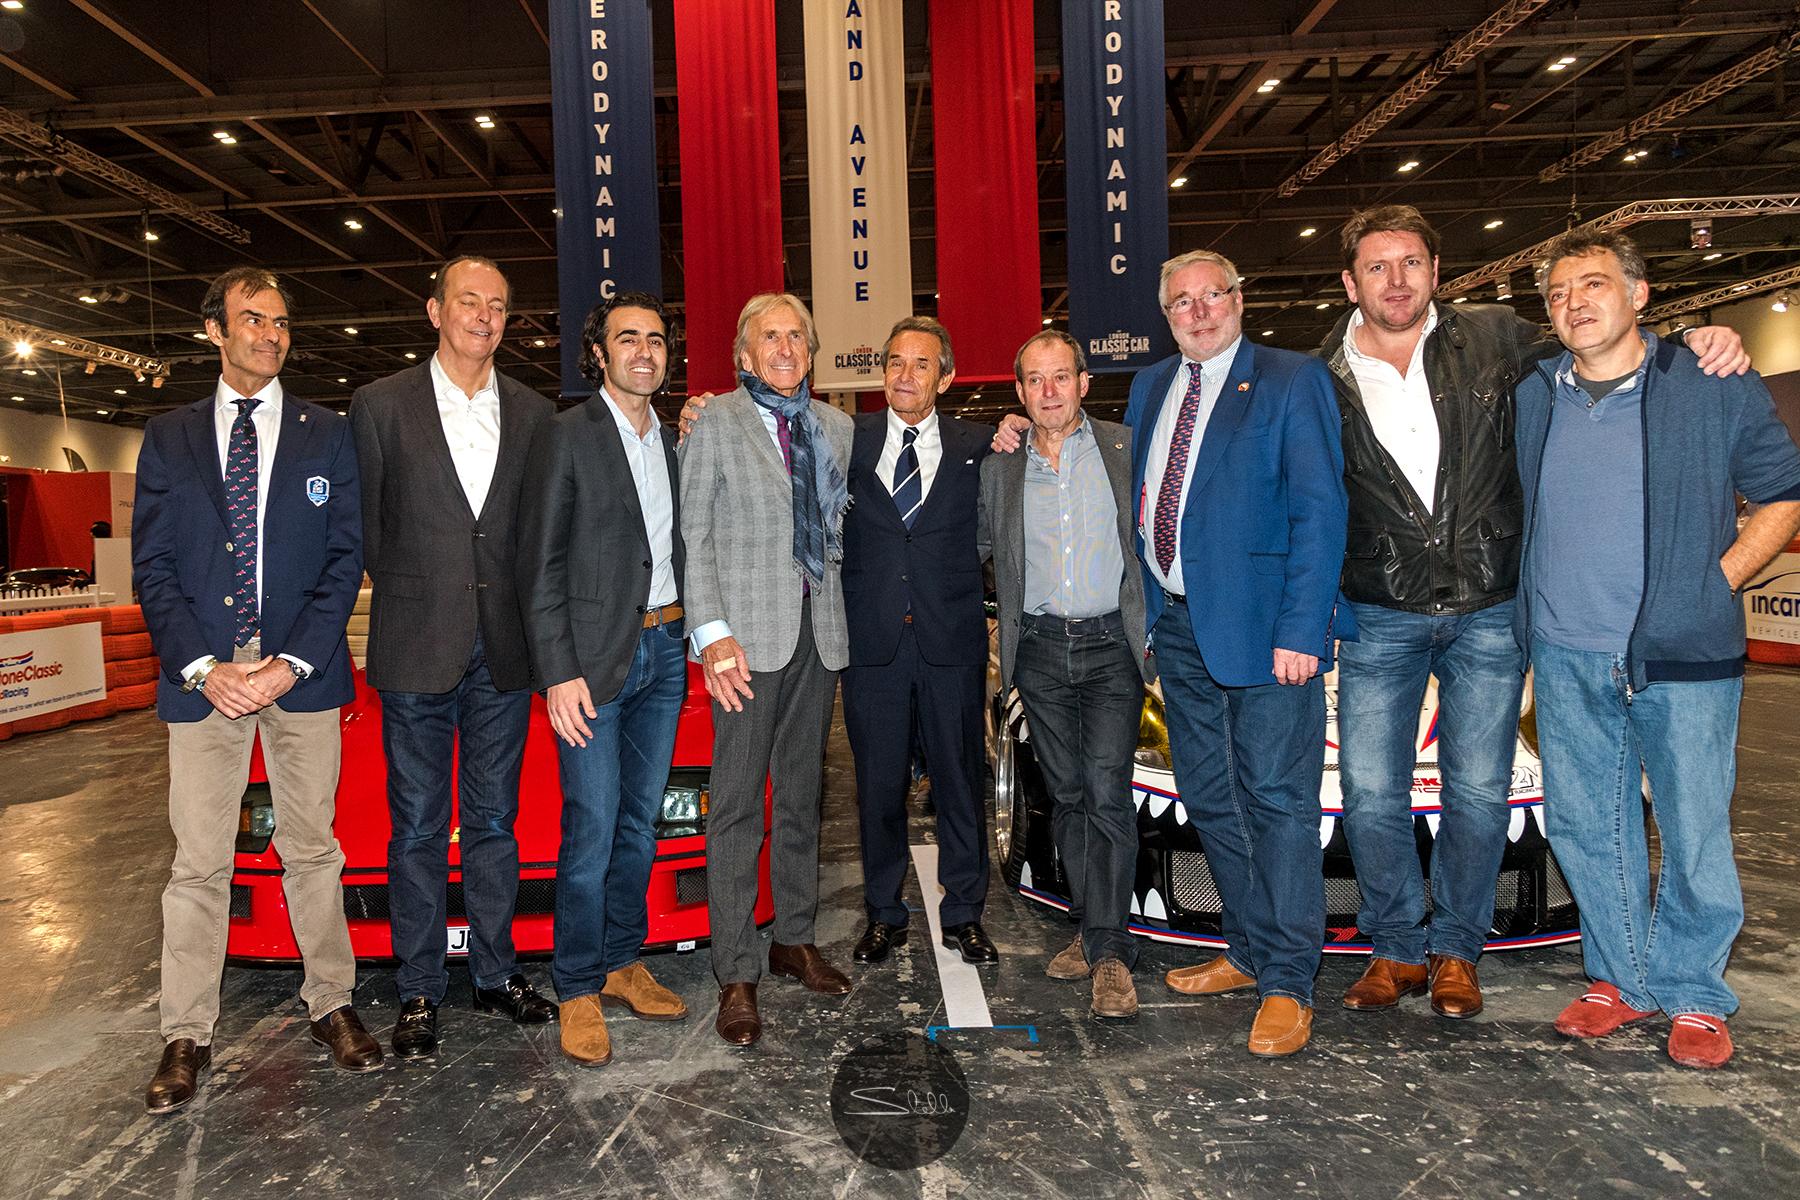 Stella Scordellis London Classic Car Show 2017 43 Watermarked.jpg